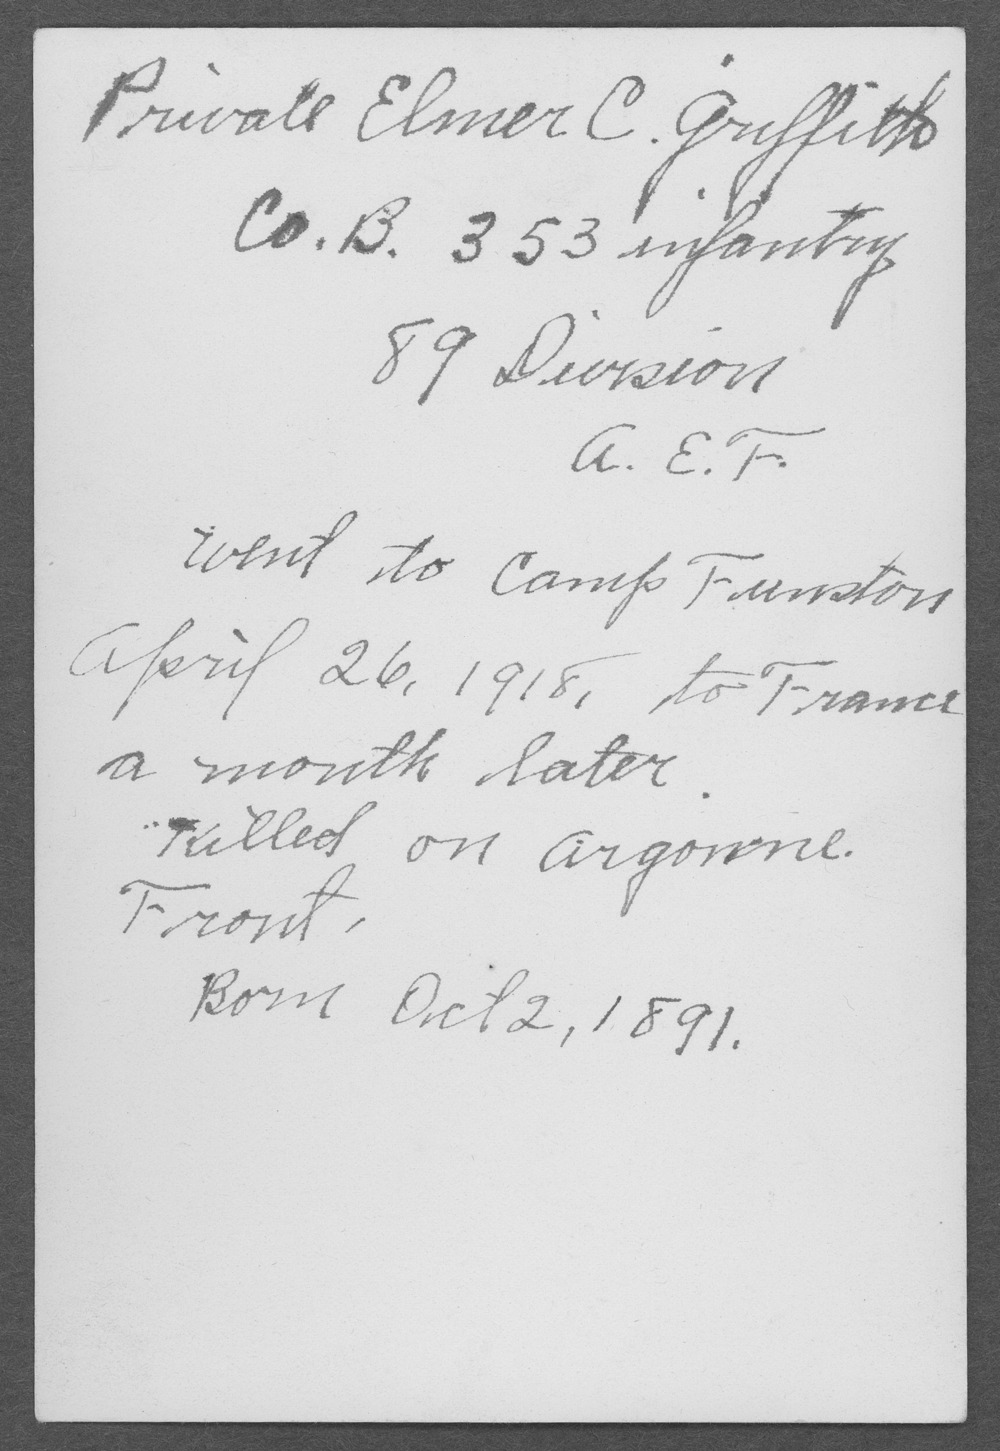 Elmer C. Griffith, World War I soldier - 2